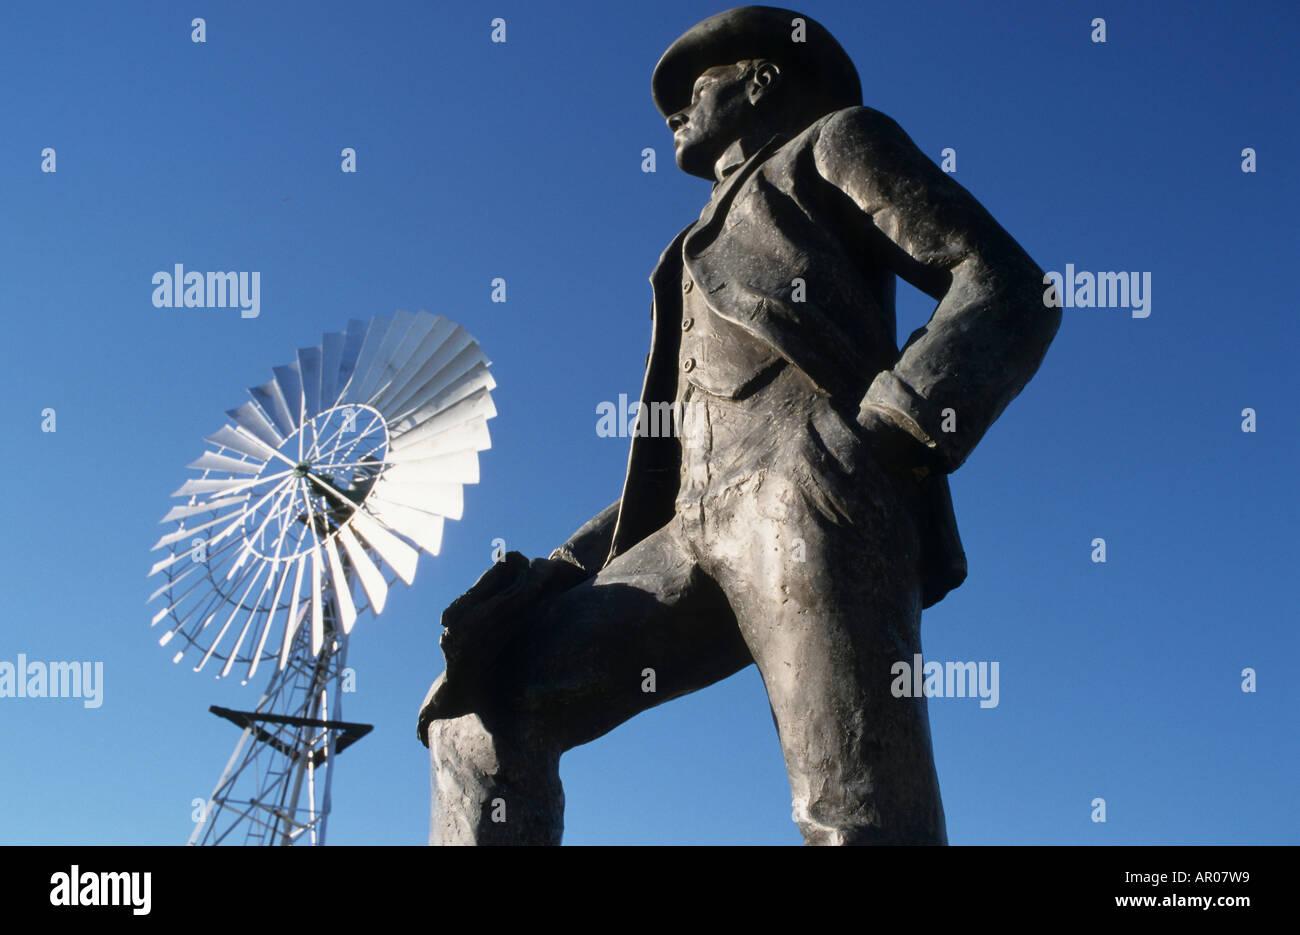 A.B. Banjo Paterson, songwriter, Matilda Hwy, Australien, Queensland, Maltilda Highway. A.B. Banjo Paterson statue. Author of Wa - Stock Image